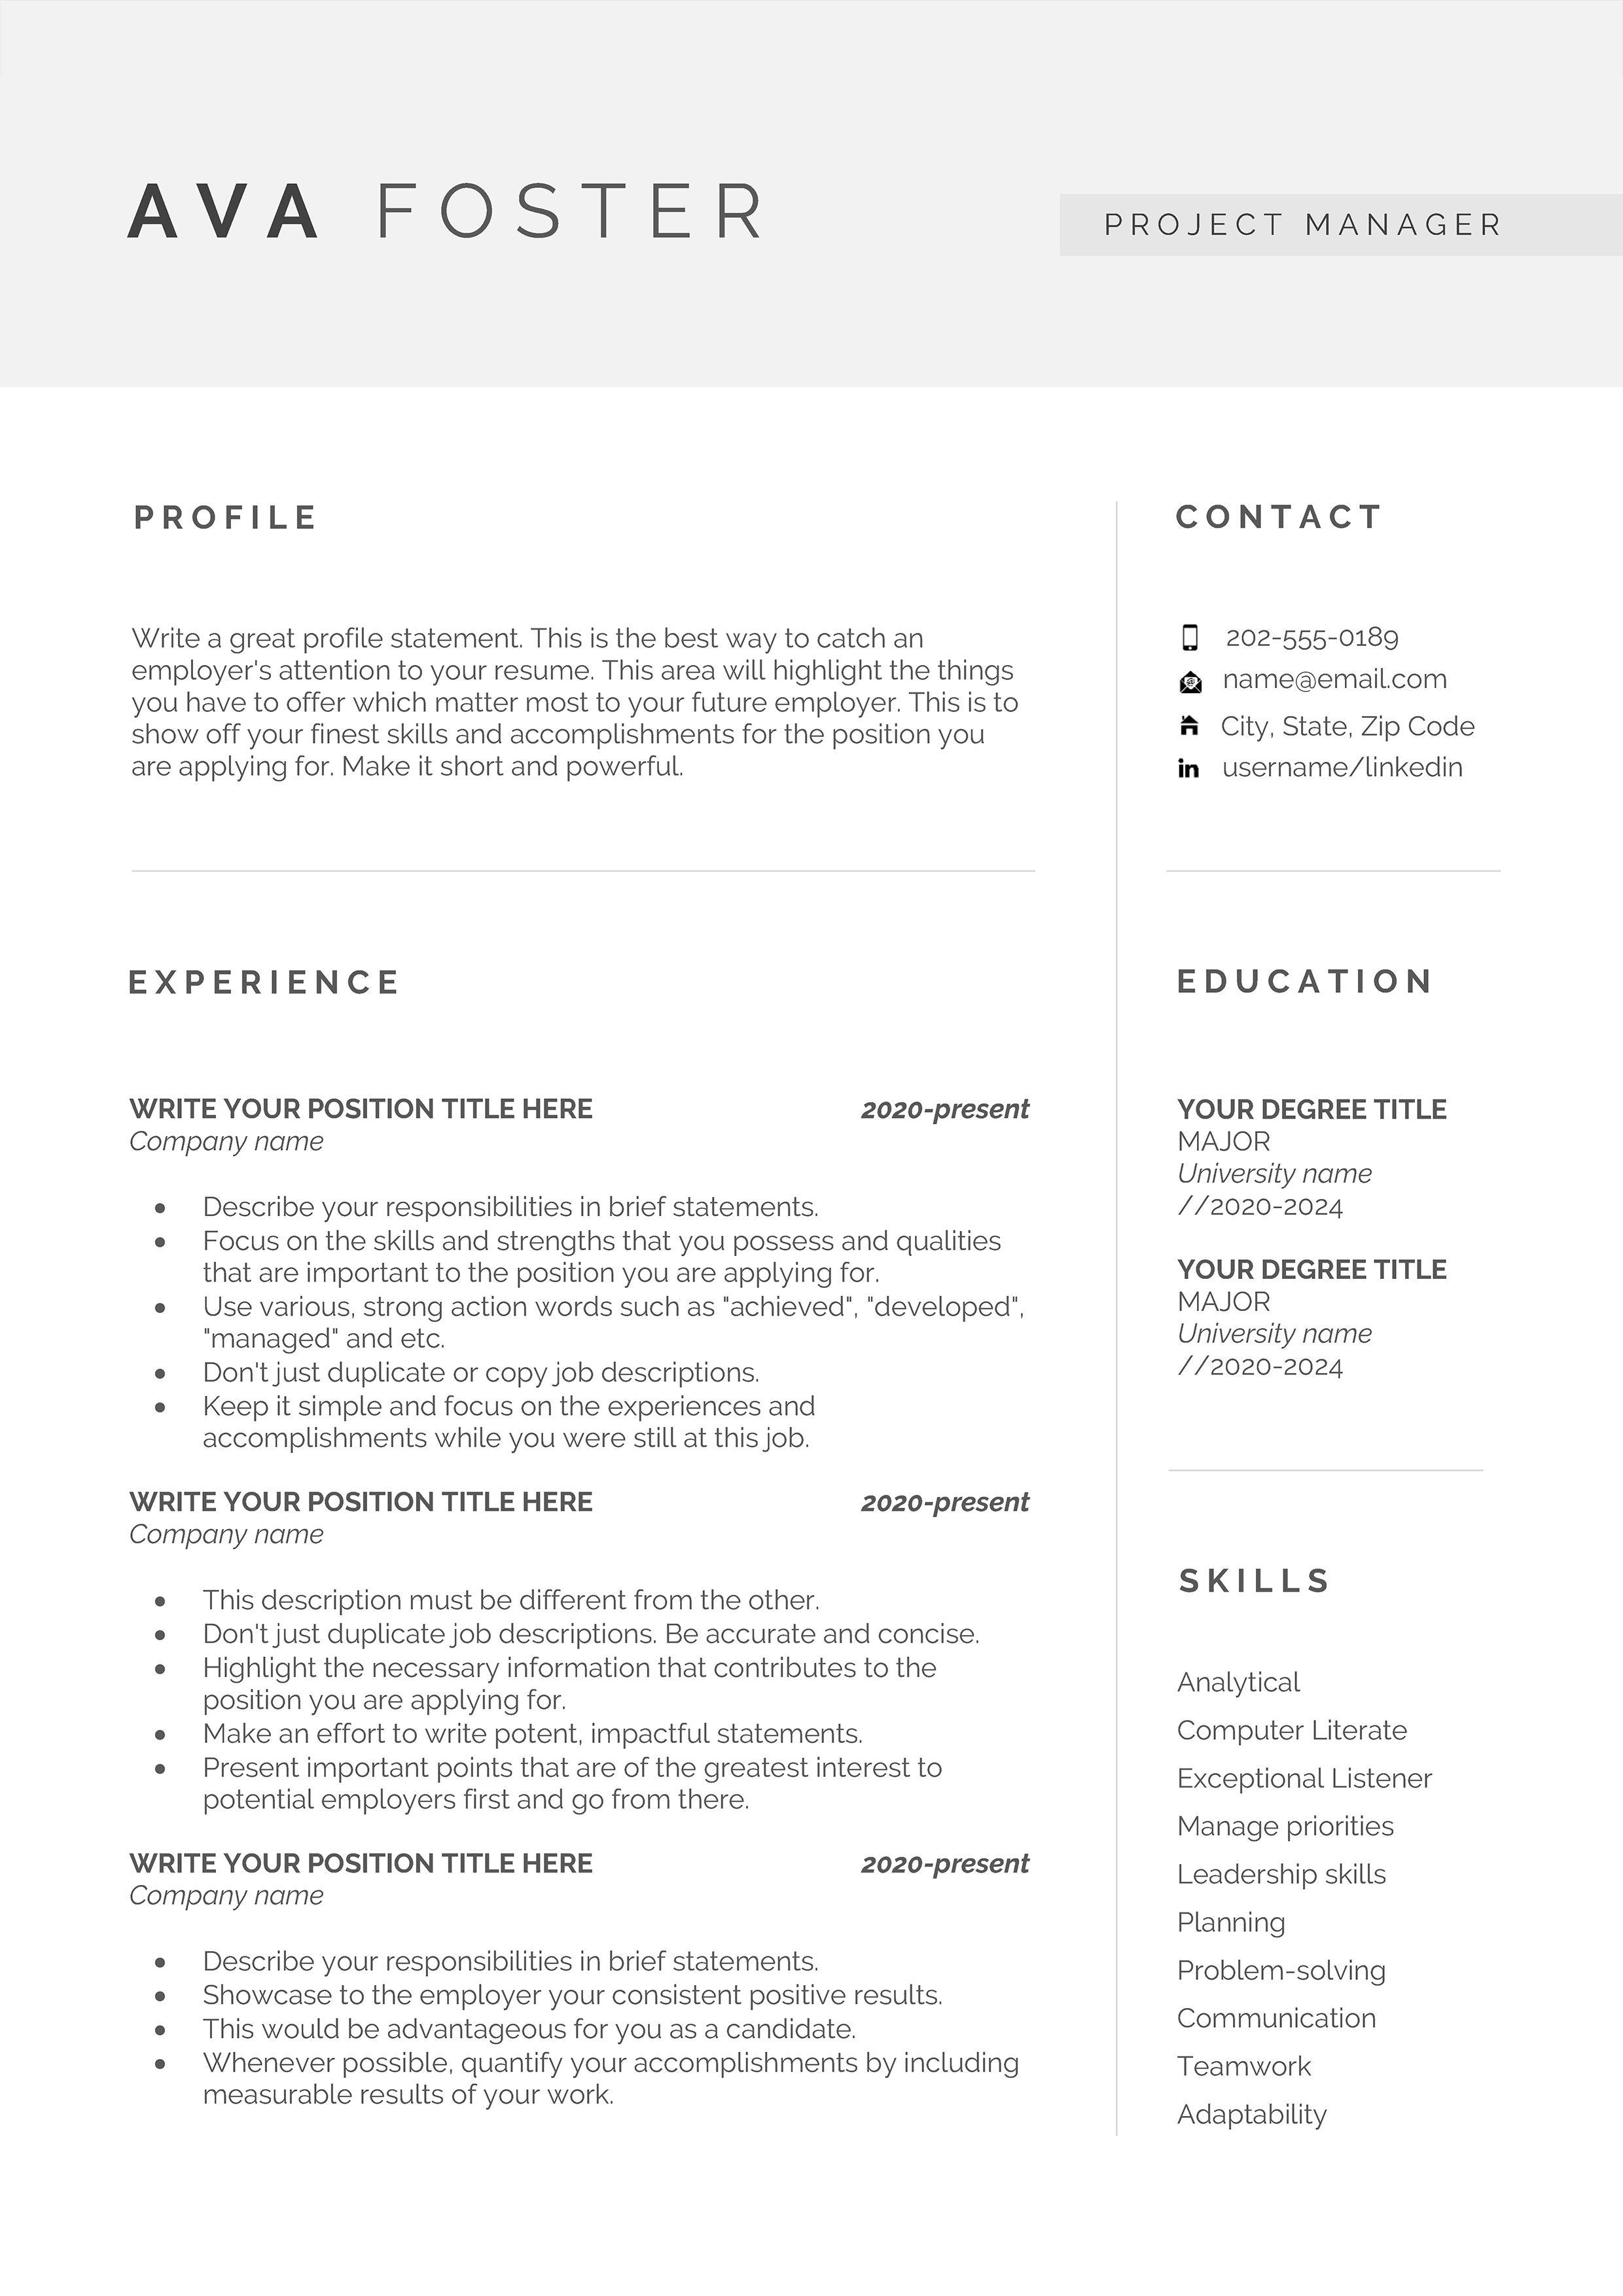 Professional resume template, Resume template, Resume